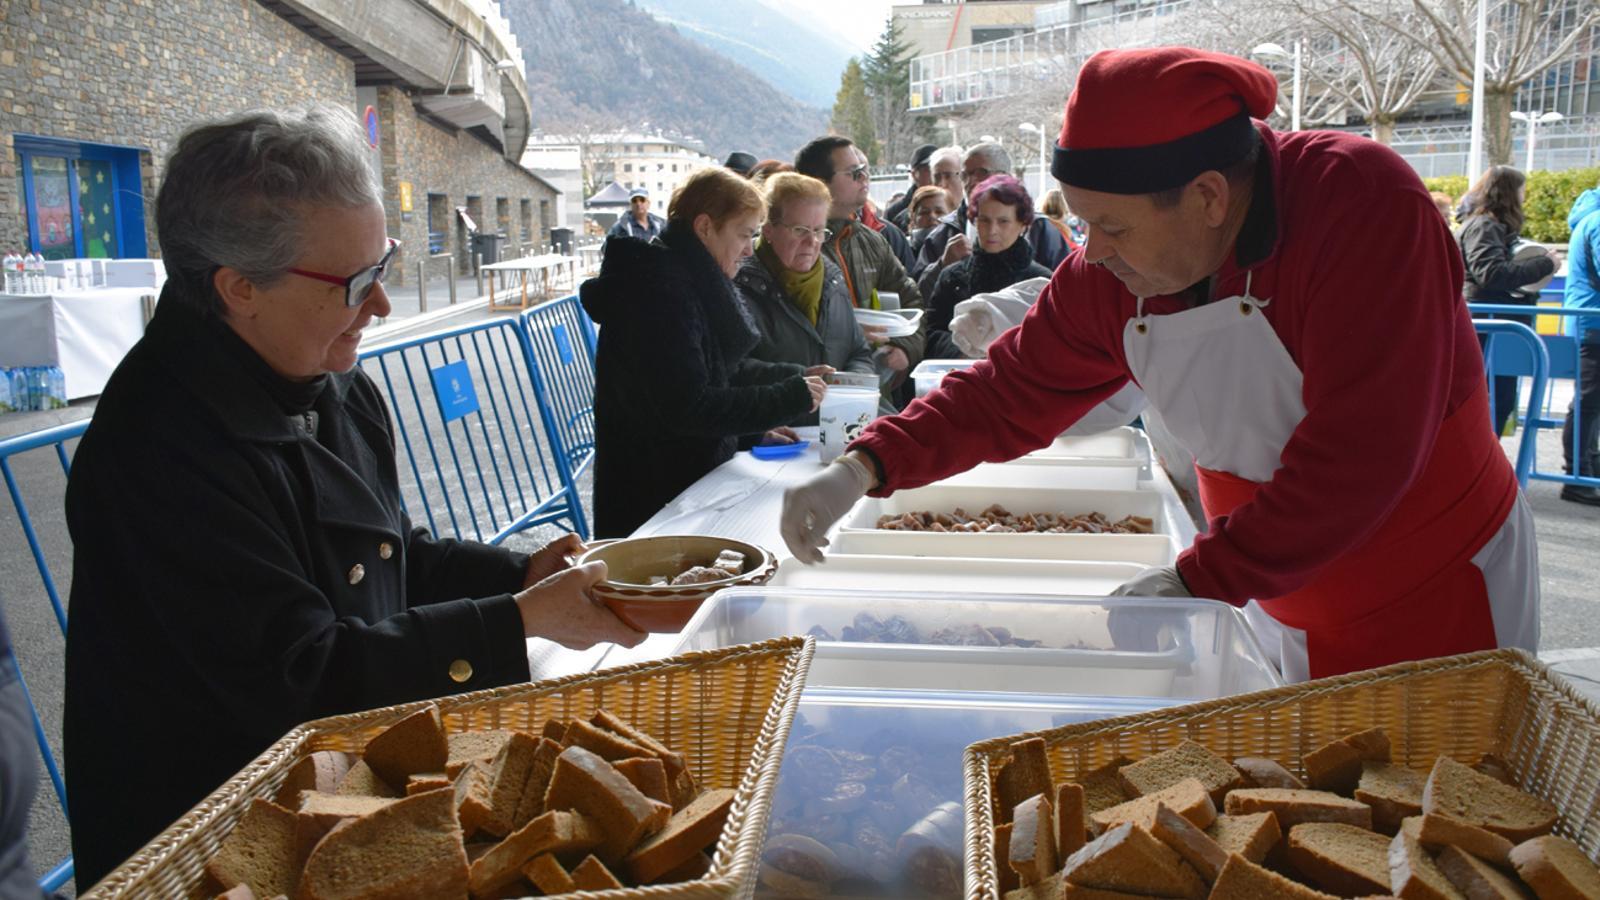 L'escudella de Sant Antoni celebrada a Andorra la Vella i Escaldes-Engordany